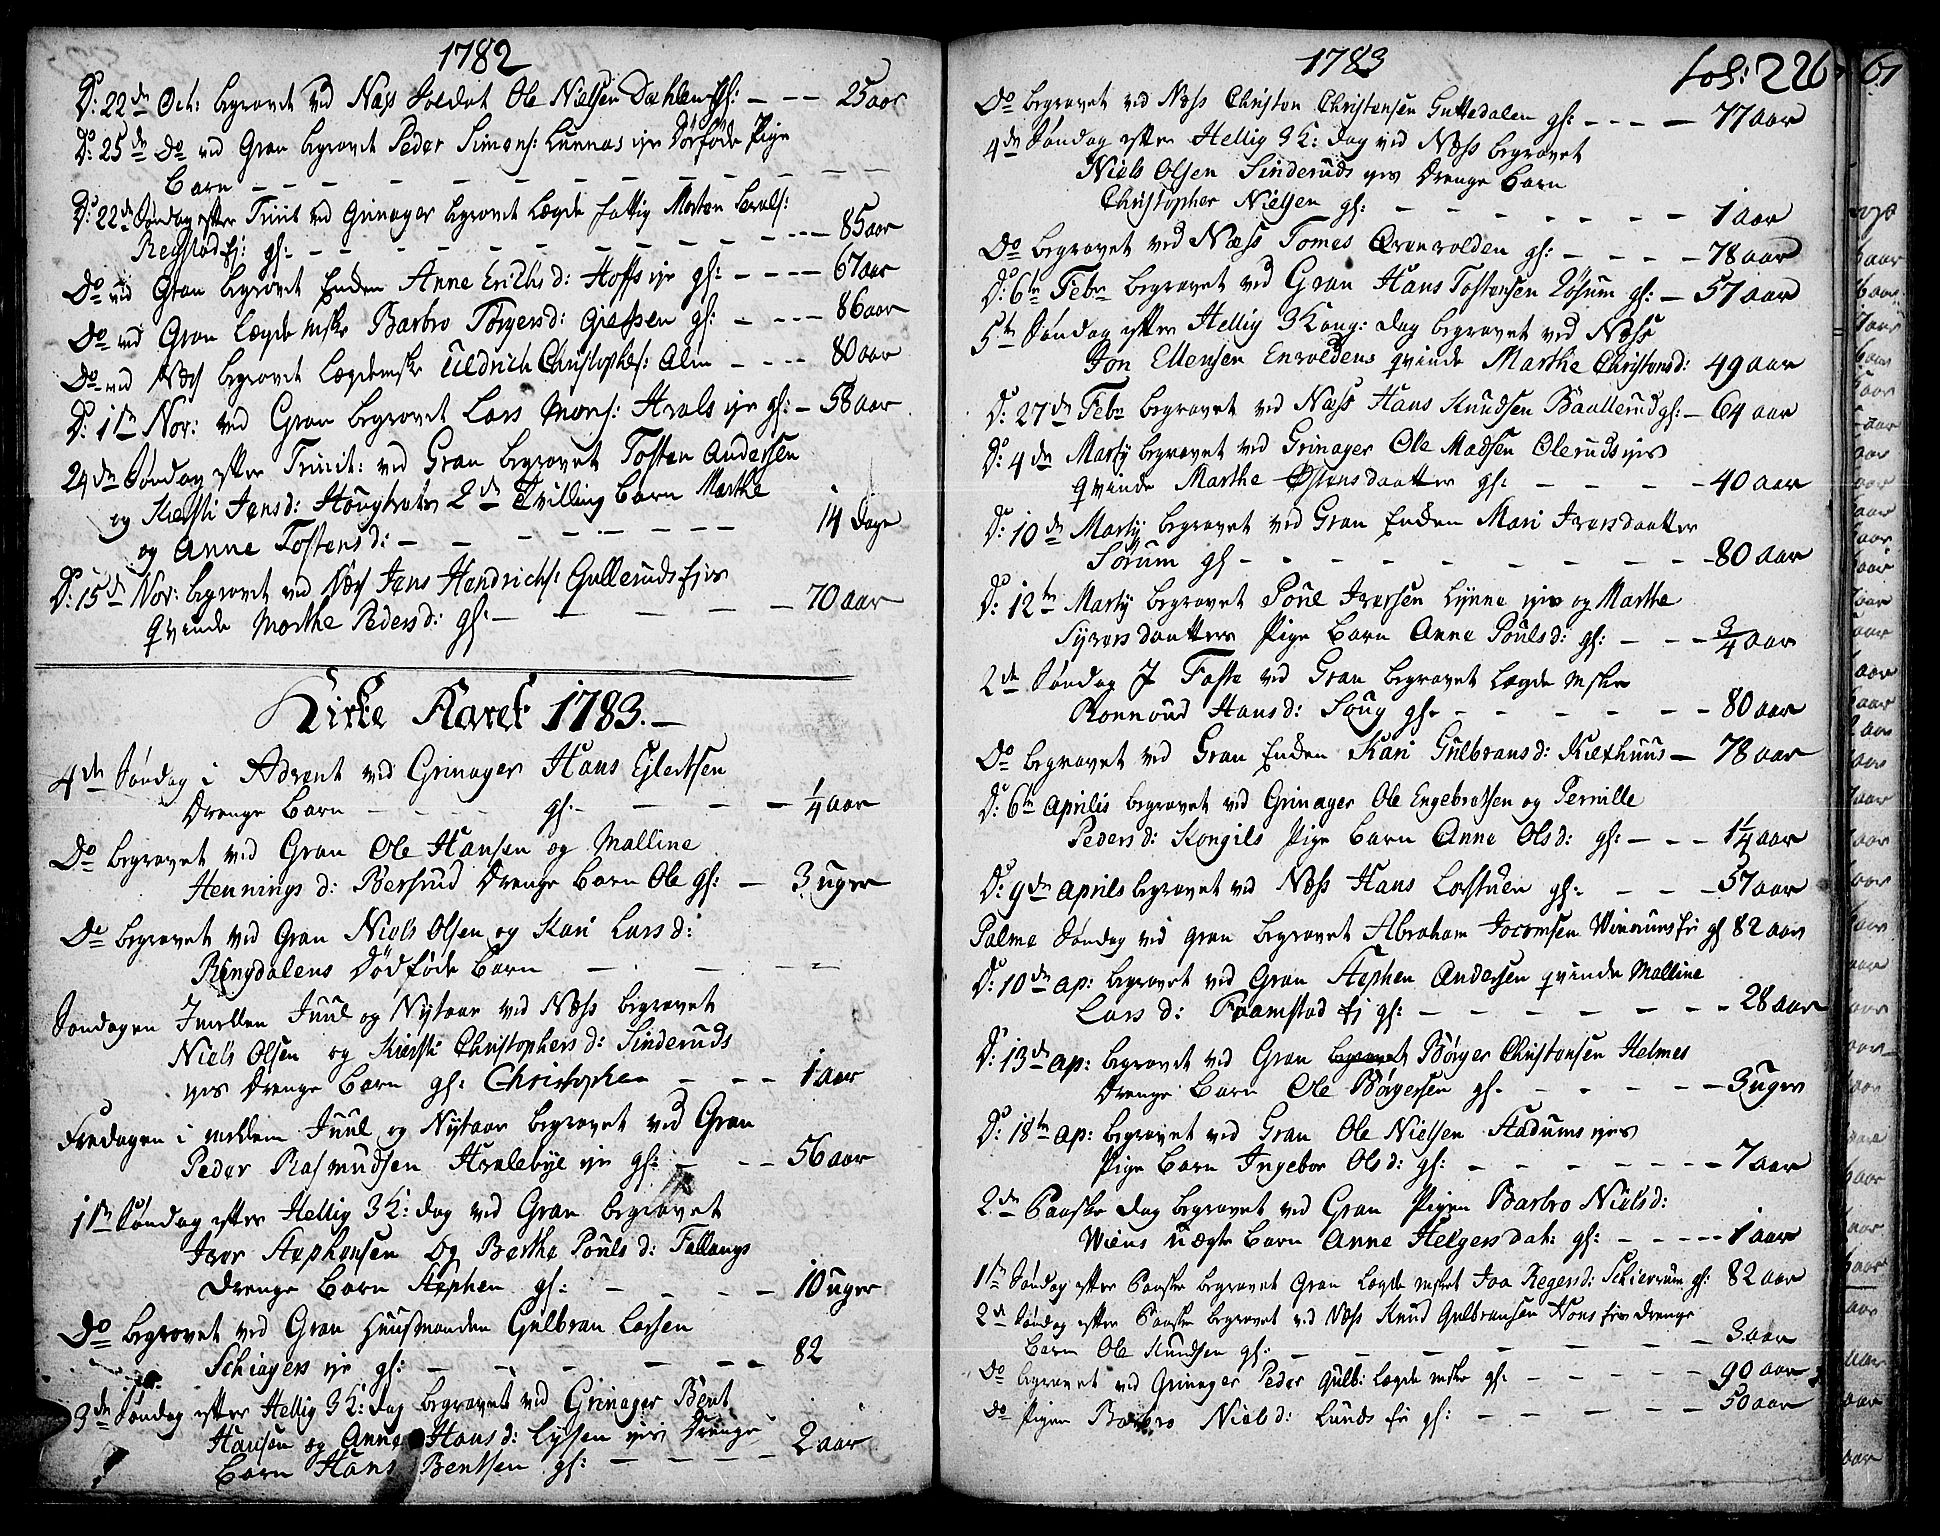 SAH, Gran prestekontor, Ministerialbok nr. 5, 1776-1788, s. 226